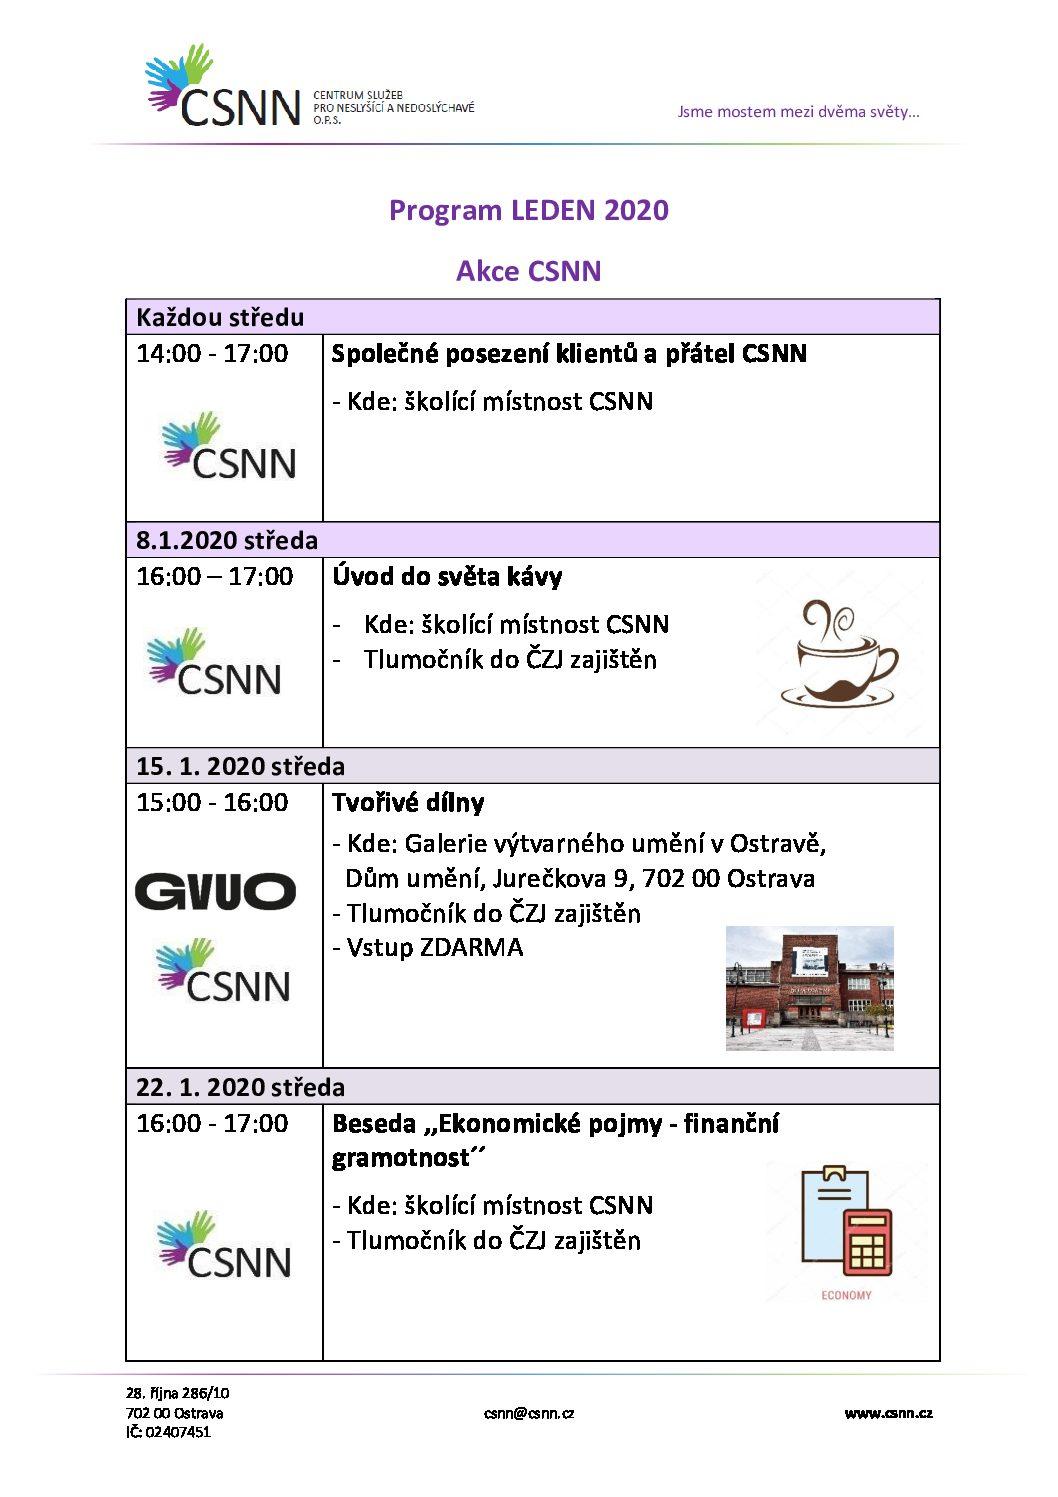 Program CSNN leden 2020